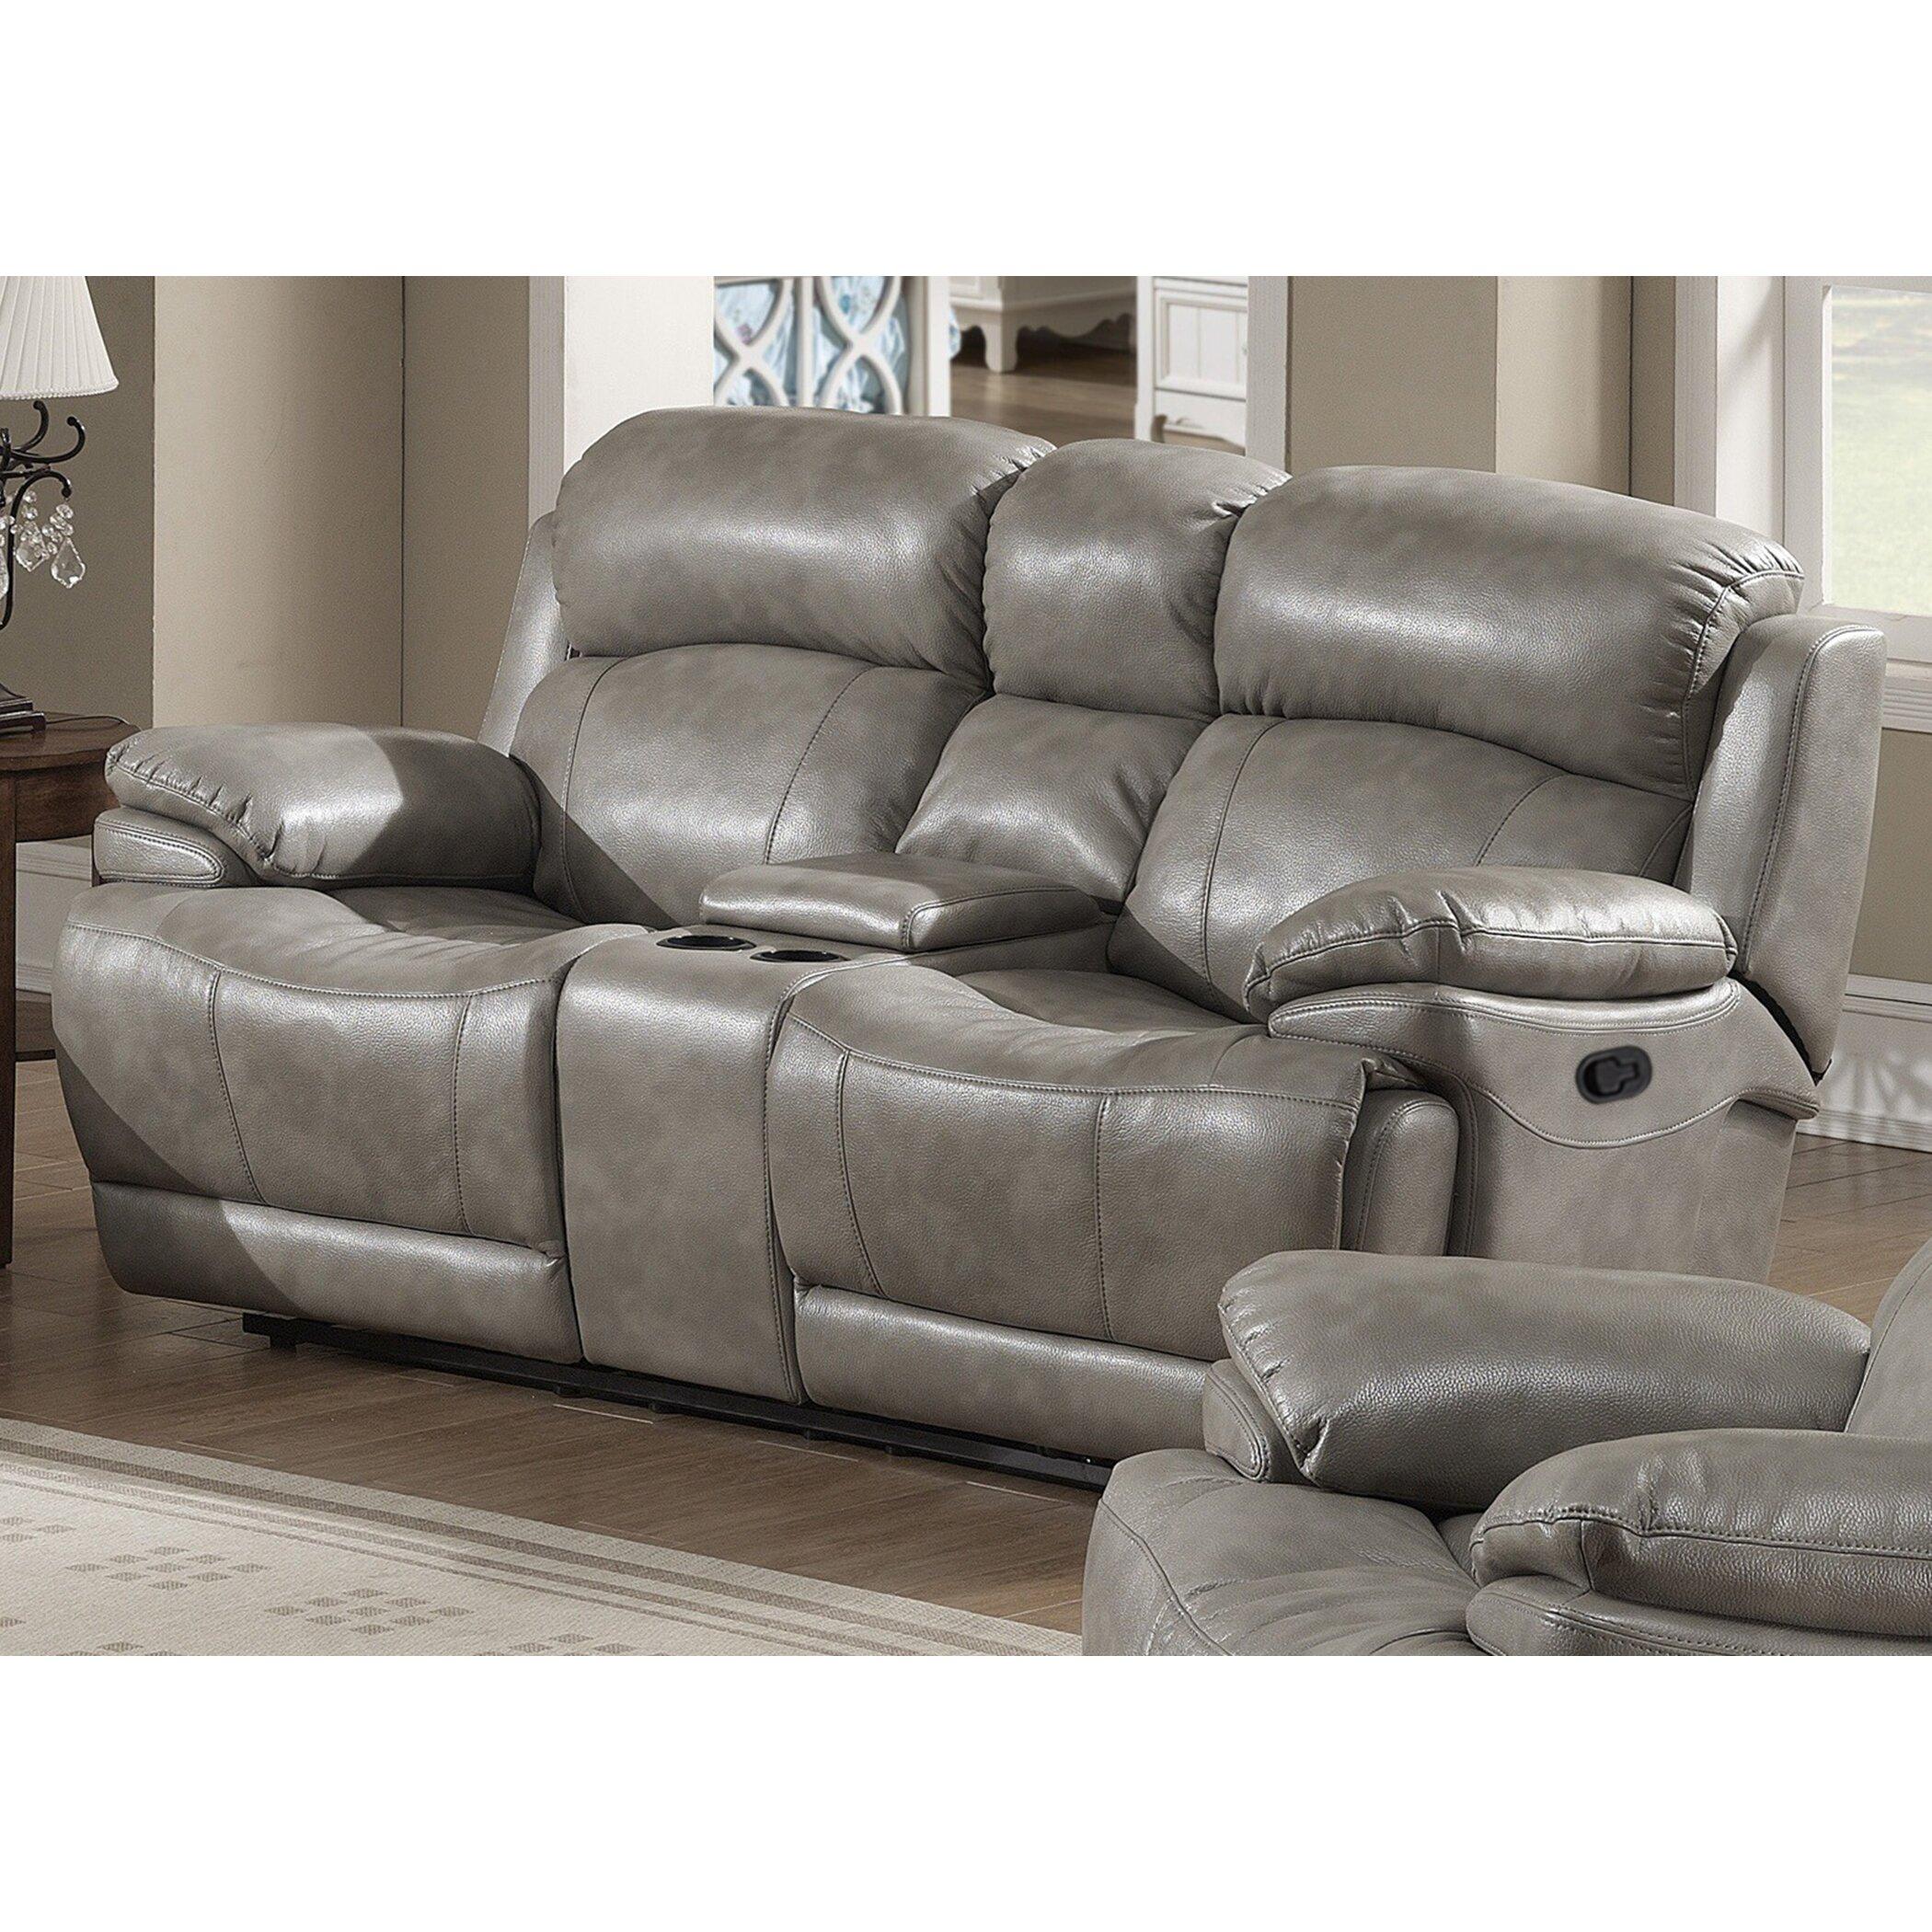 ac pacific estella 3 piece living room set | wayfair